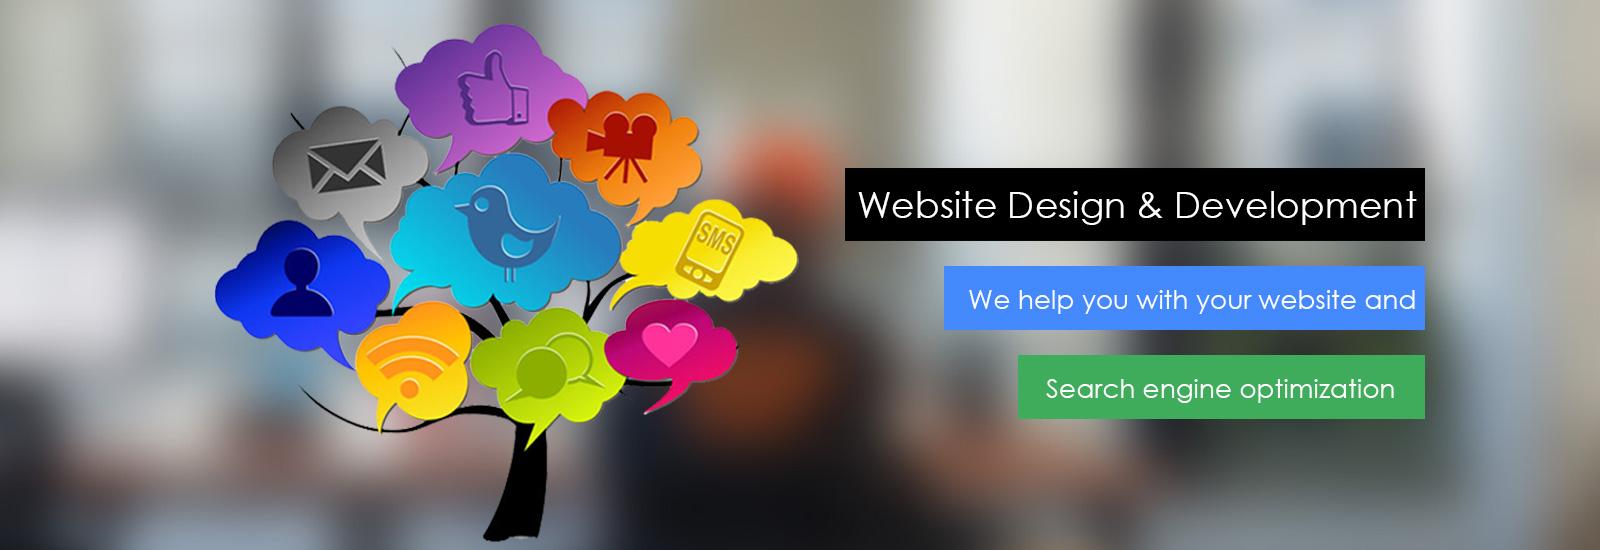 Barrie website design services